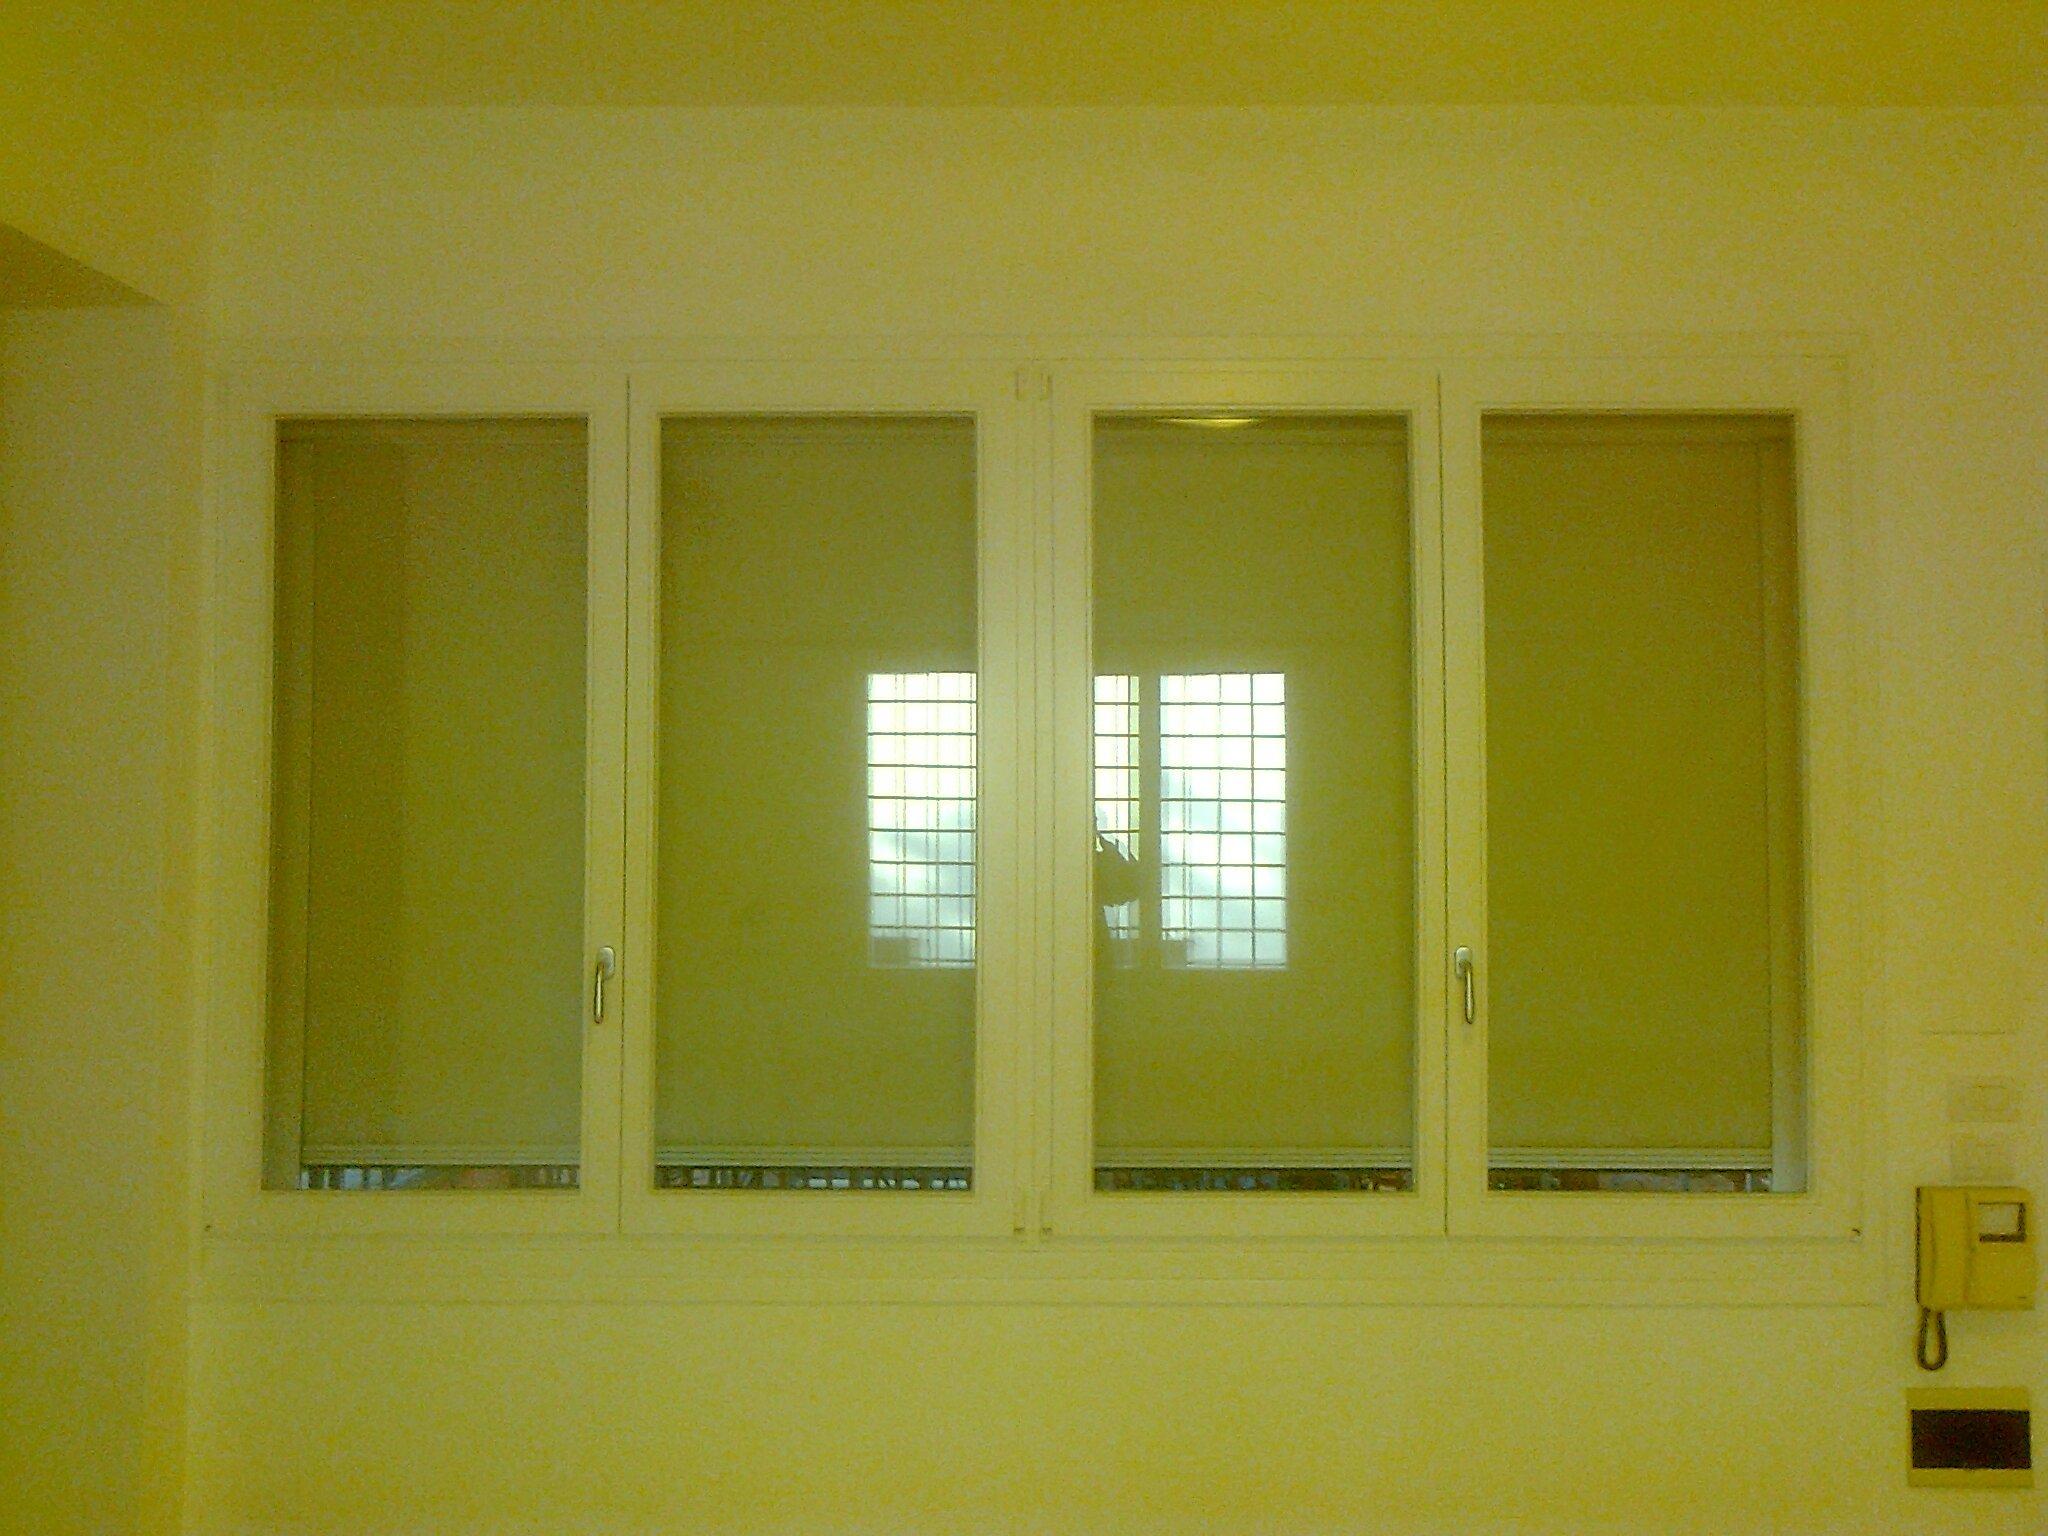 Finestra interna a parete